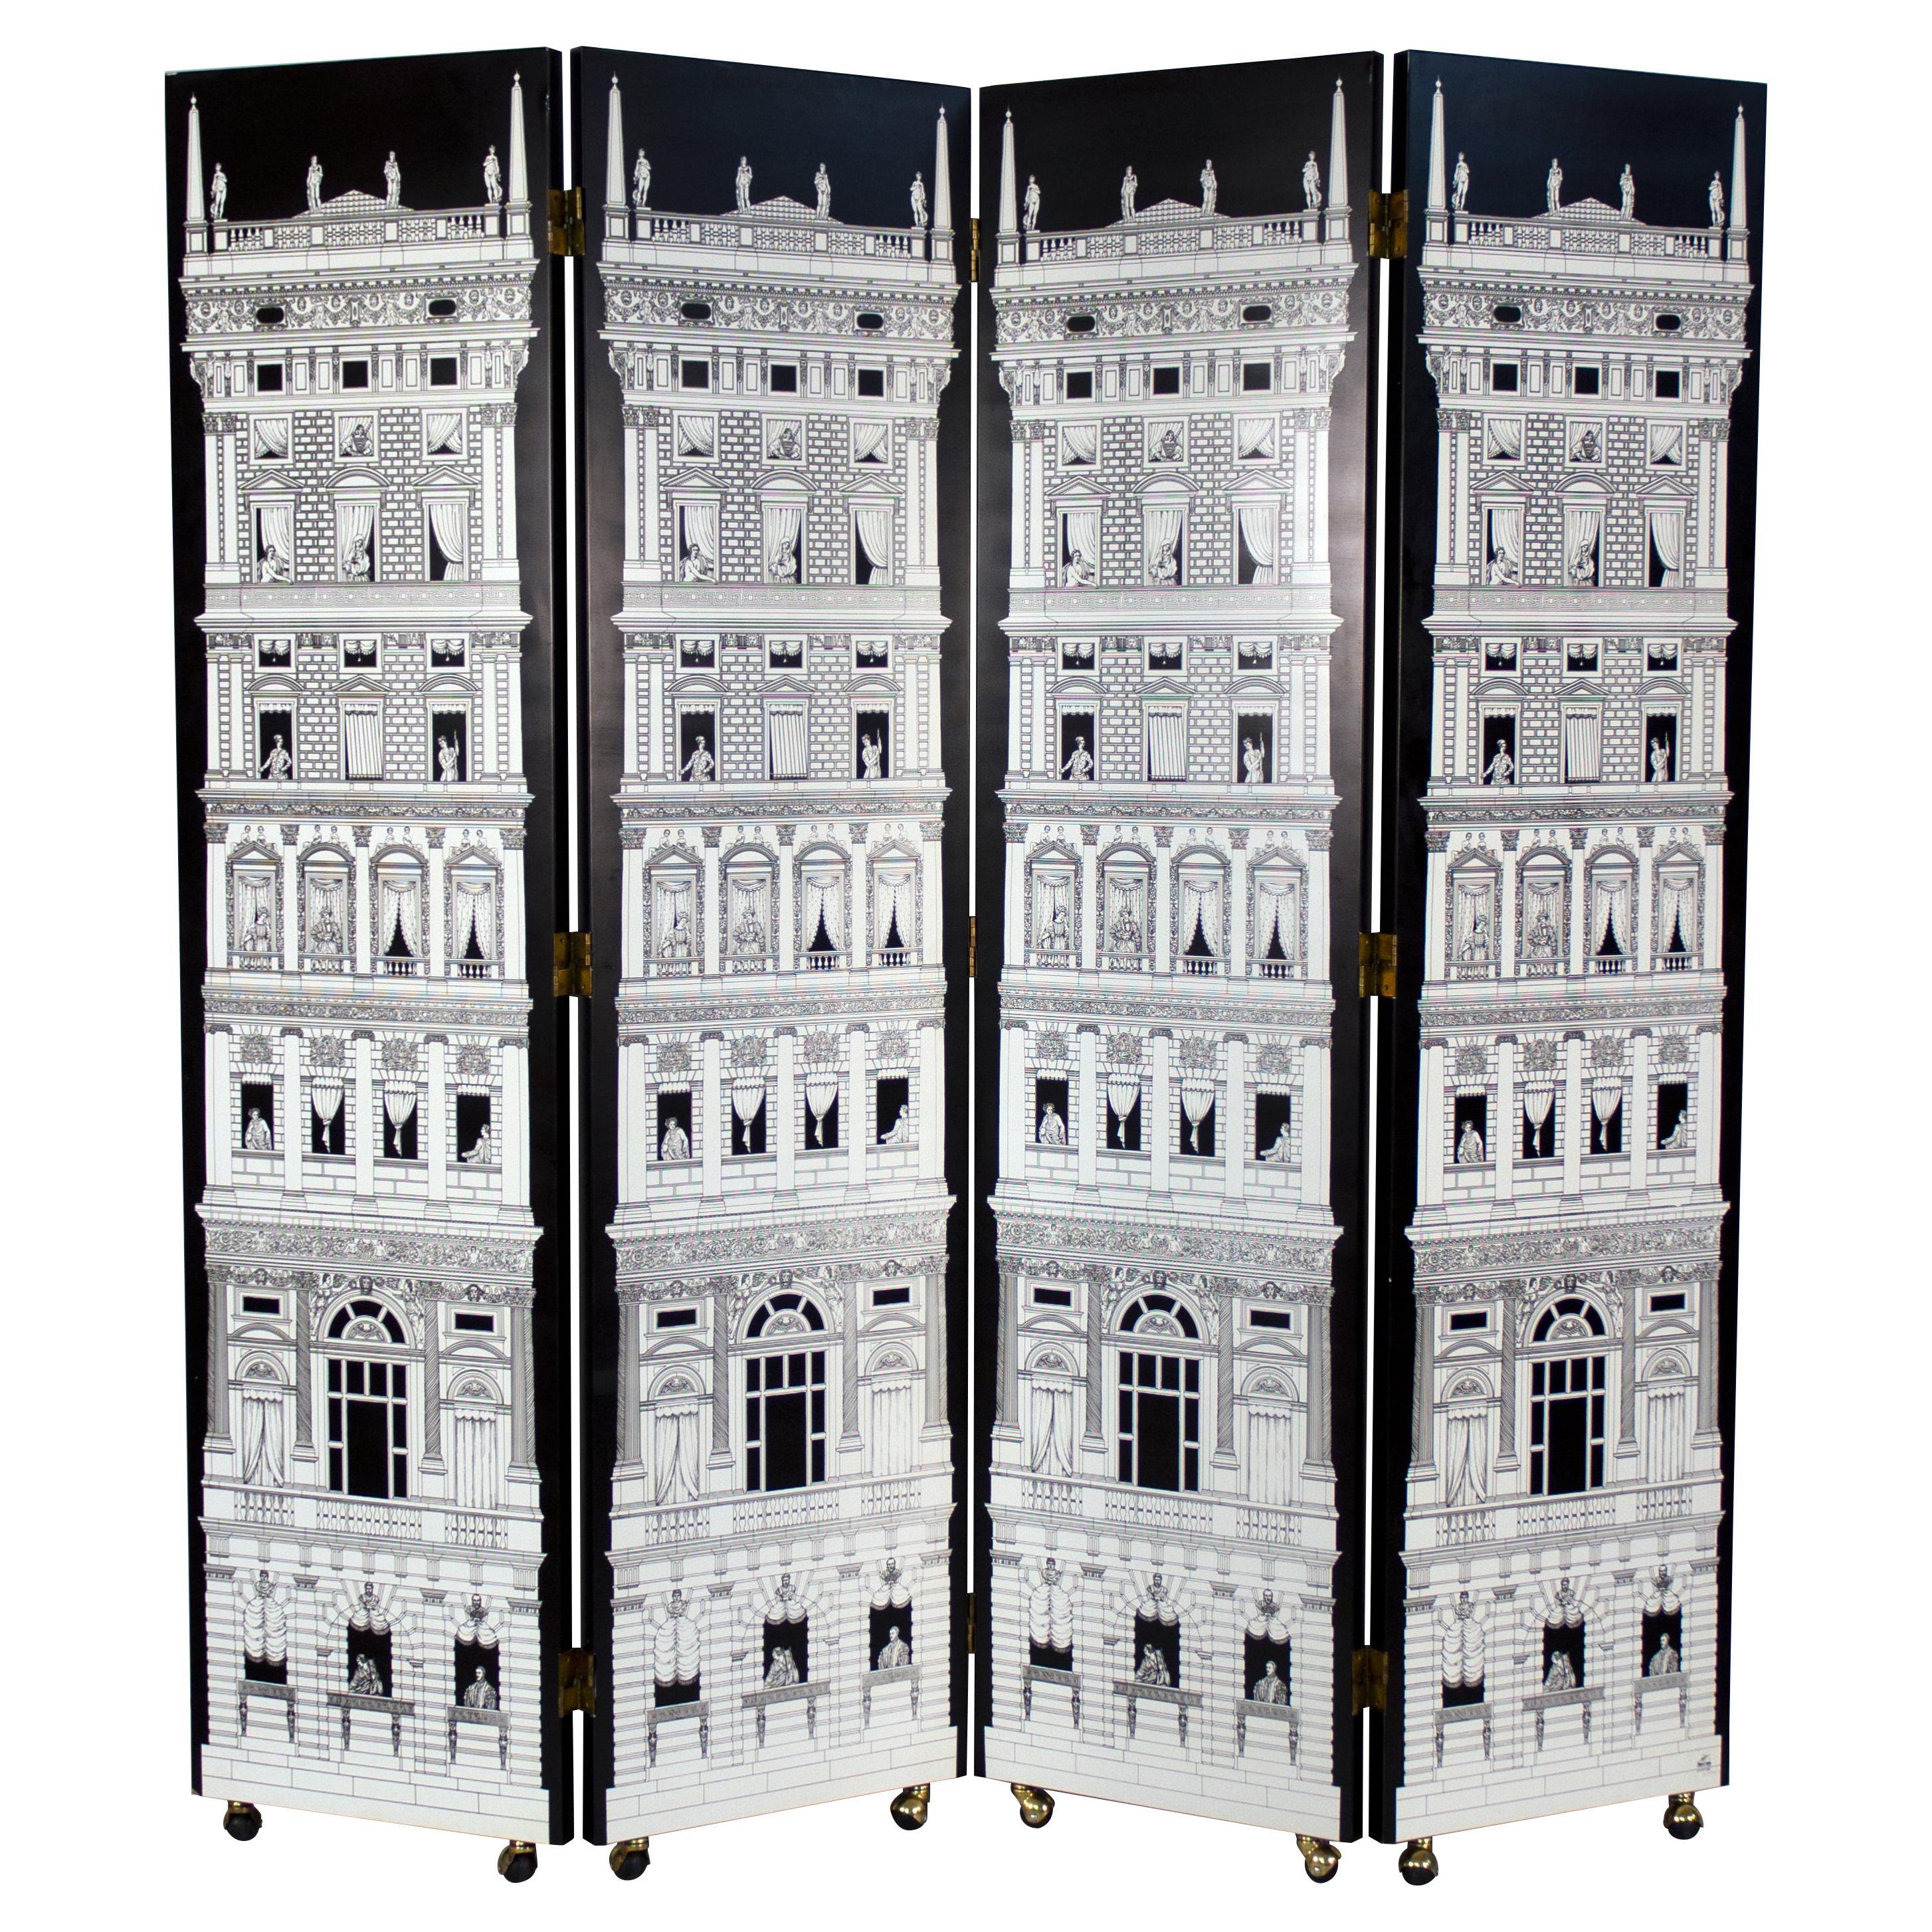 Four Panel Black and White Piero Fornasetti 'Architectura' Folding Screen